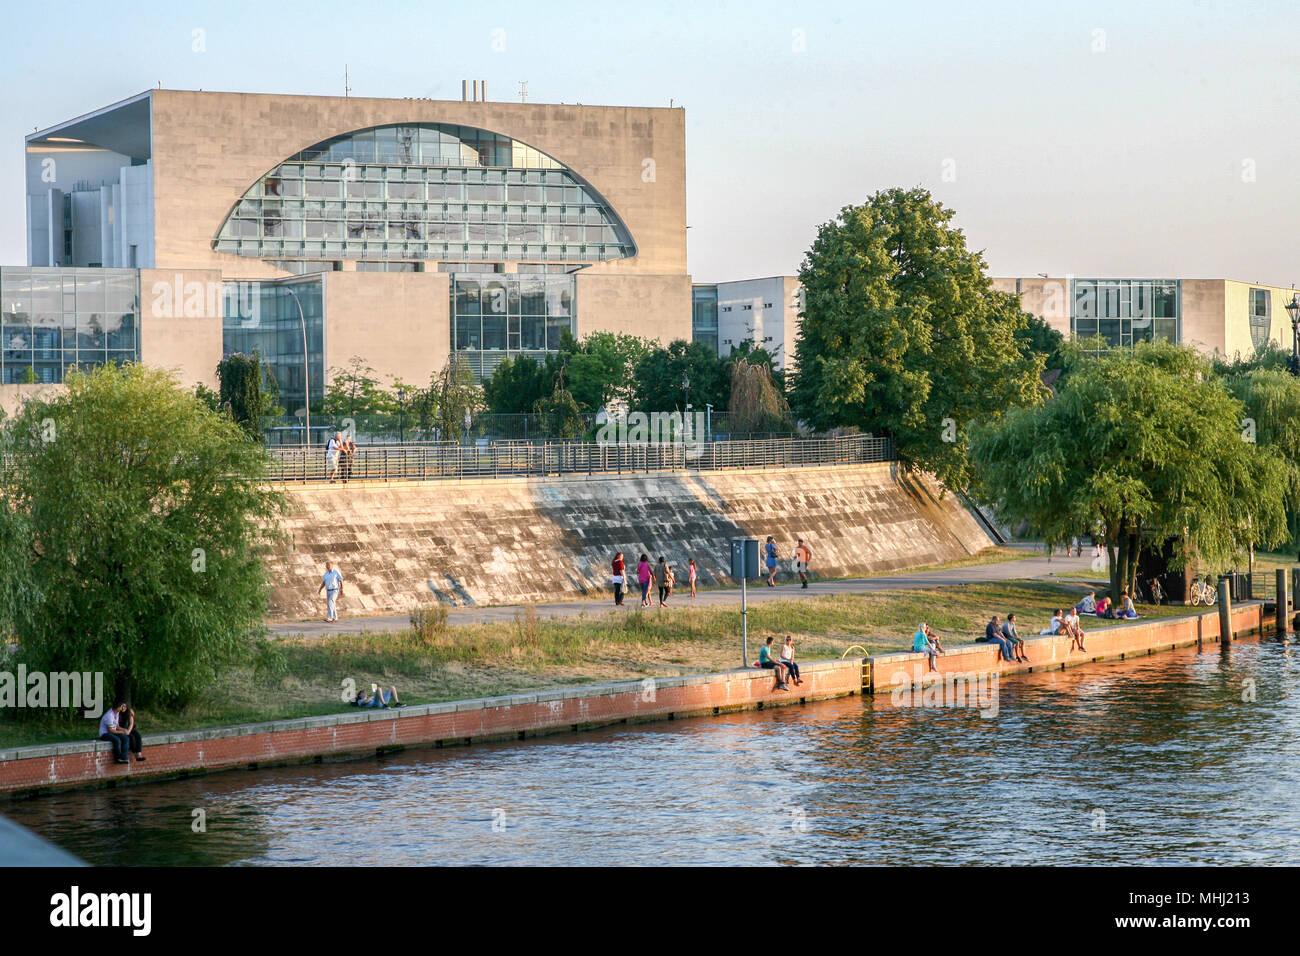 Ein Sommerabend in Berlin - Stock Image